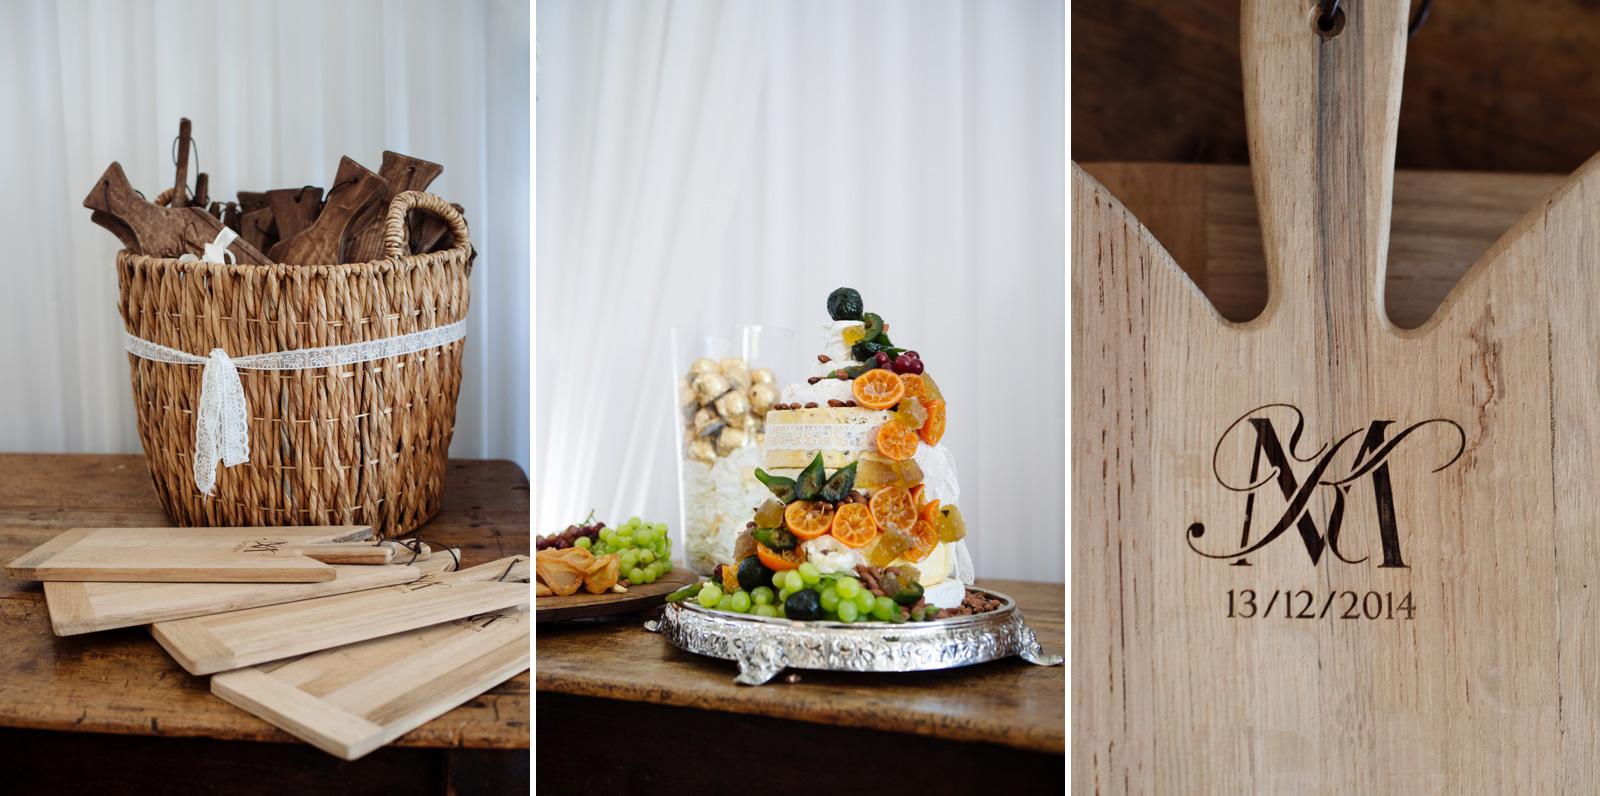 Wedding cheese boards